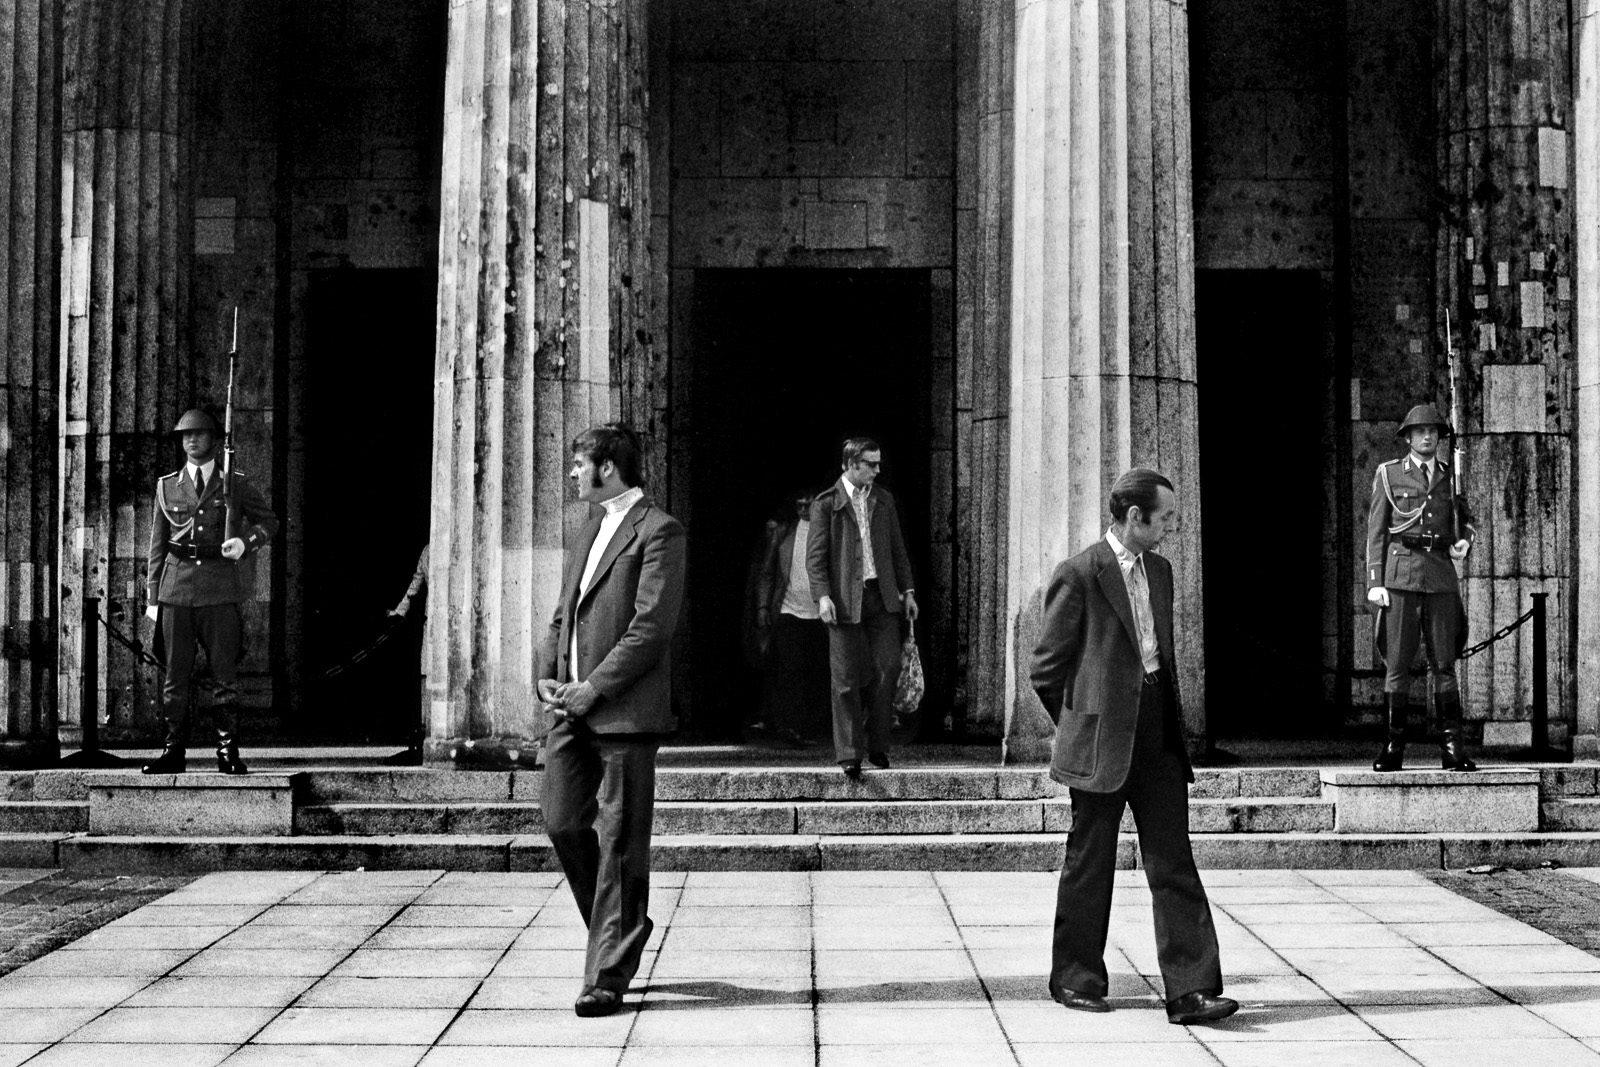 Berlino Est, 1977